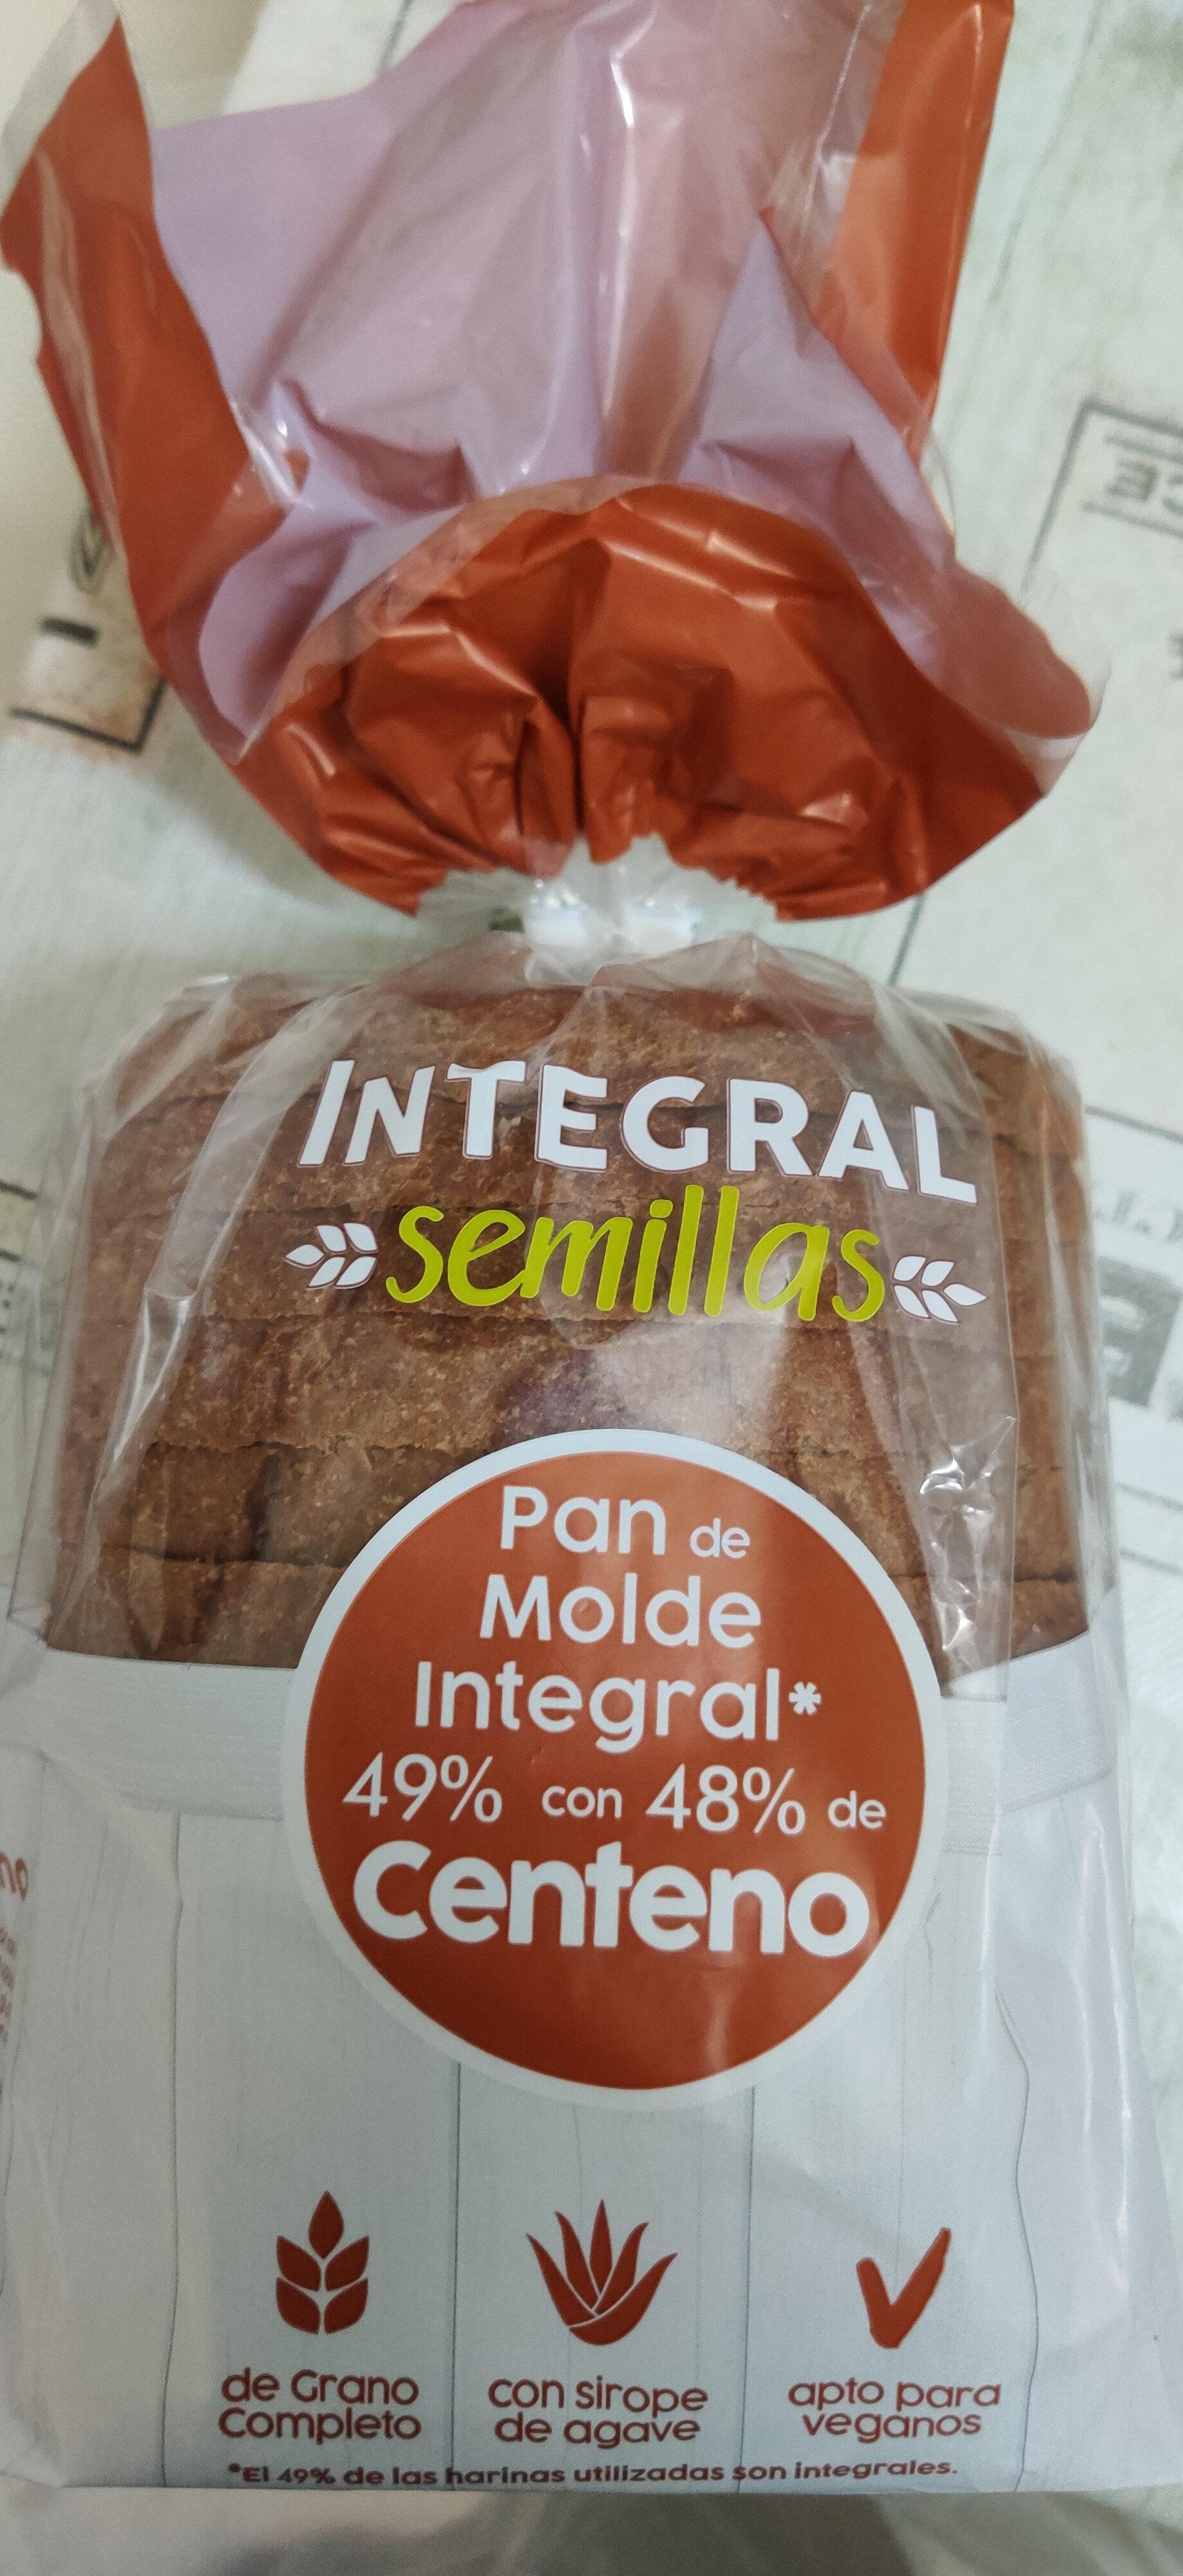 Pan de molde integral con centeno - Product - es